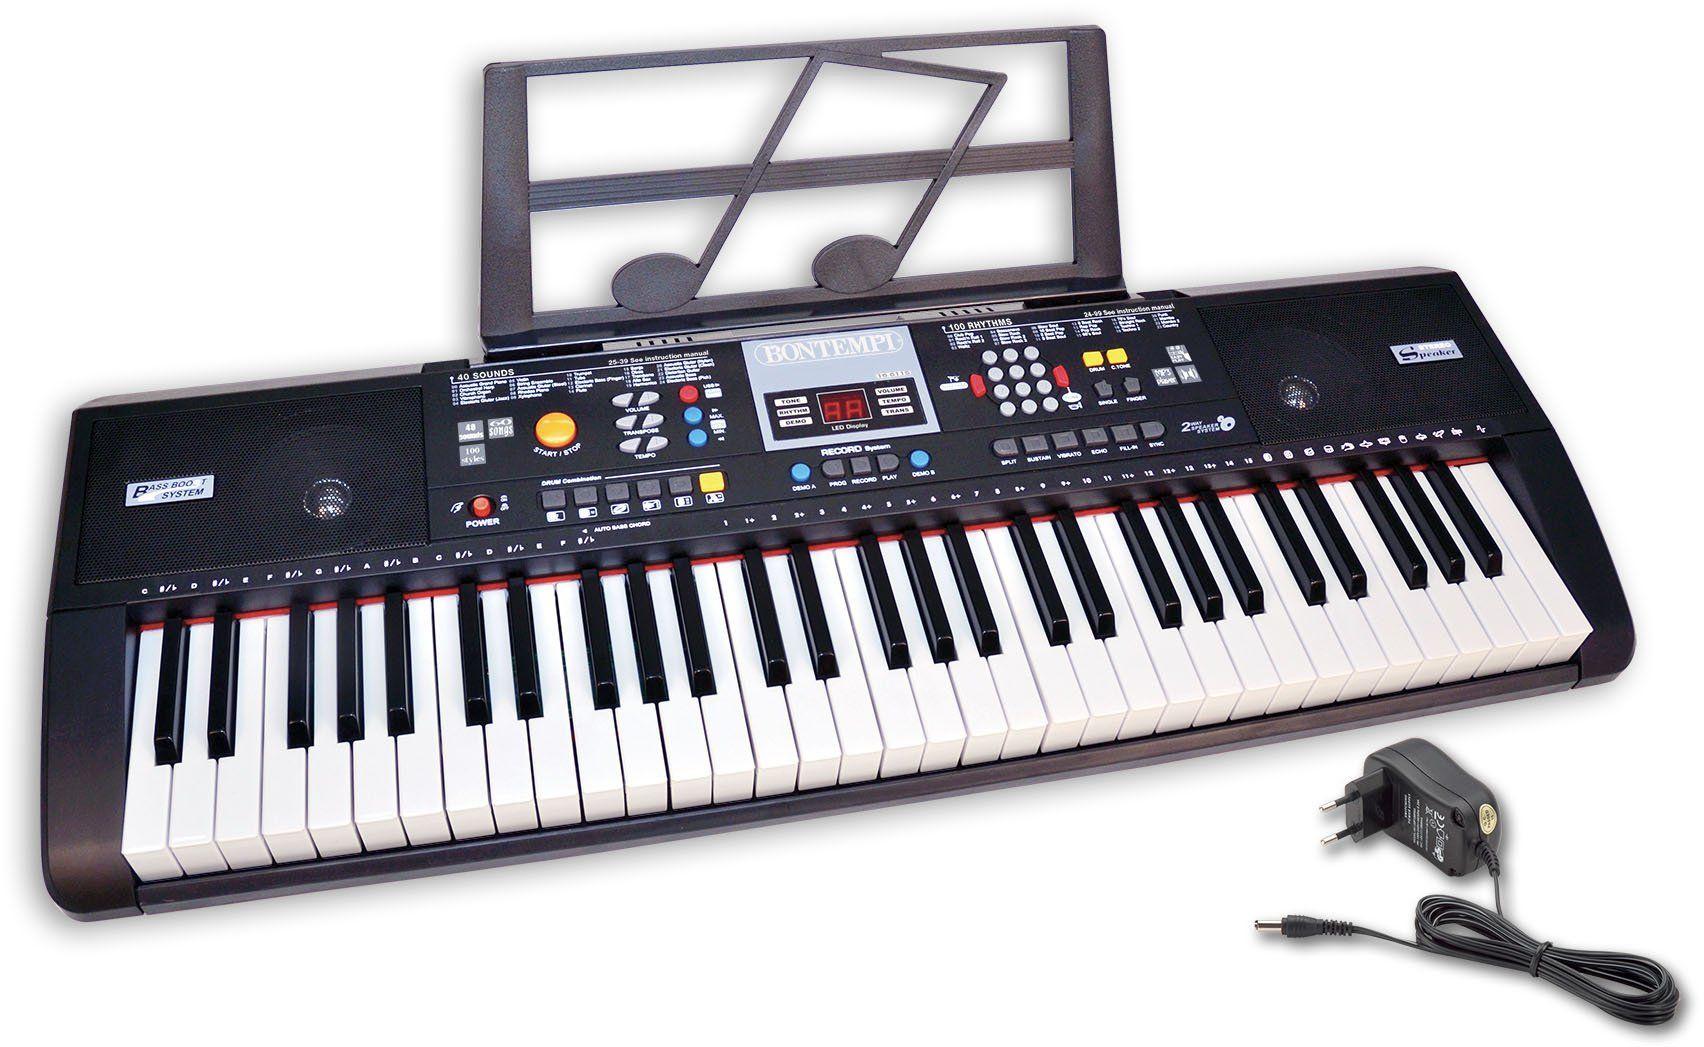 Bontempi 16 6115 Keyboard